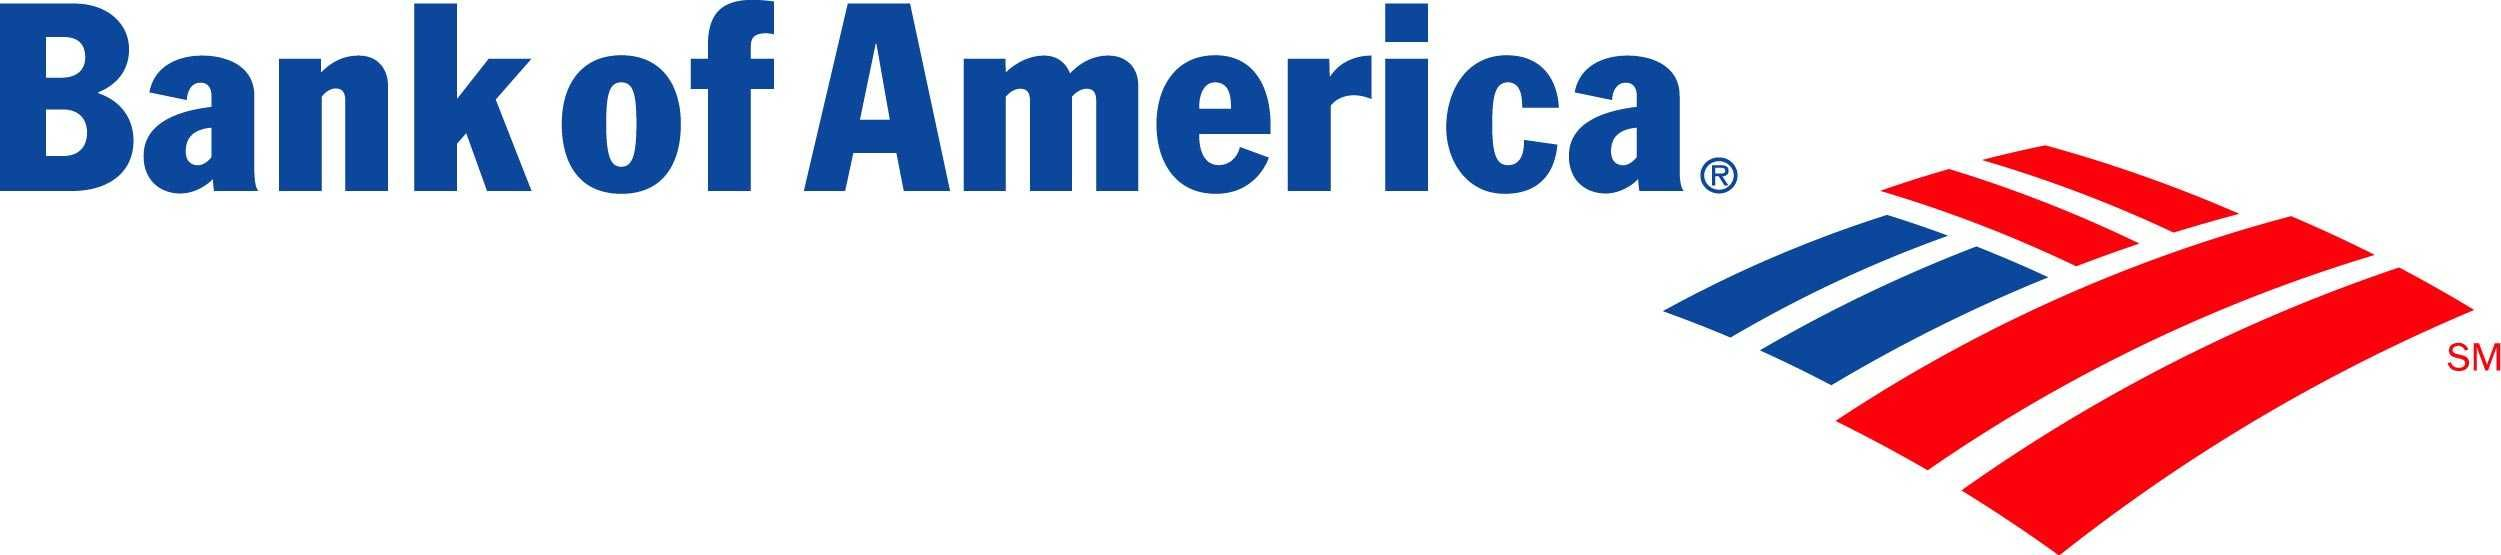 bank of america logo desktop wallpaper cute animals